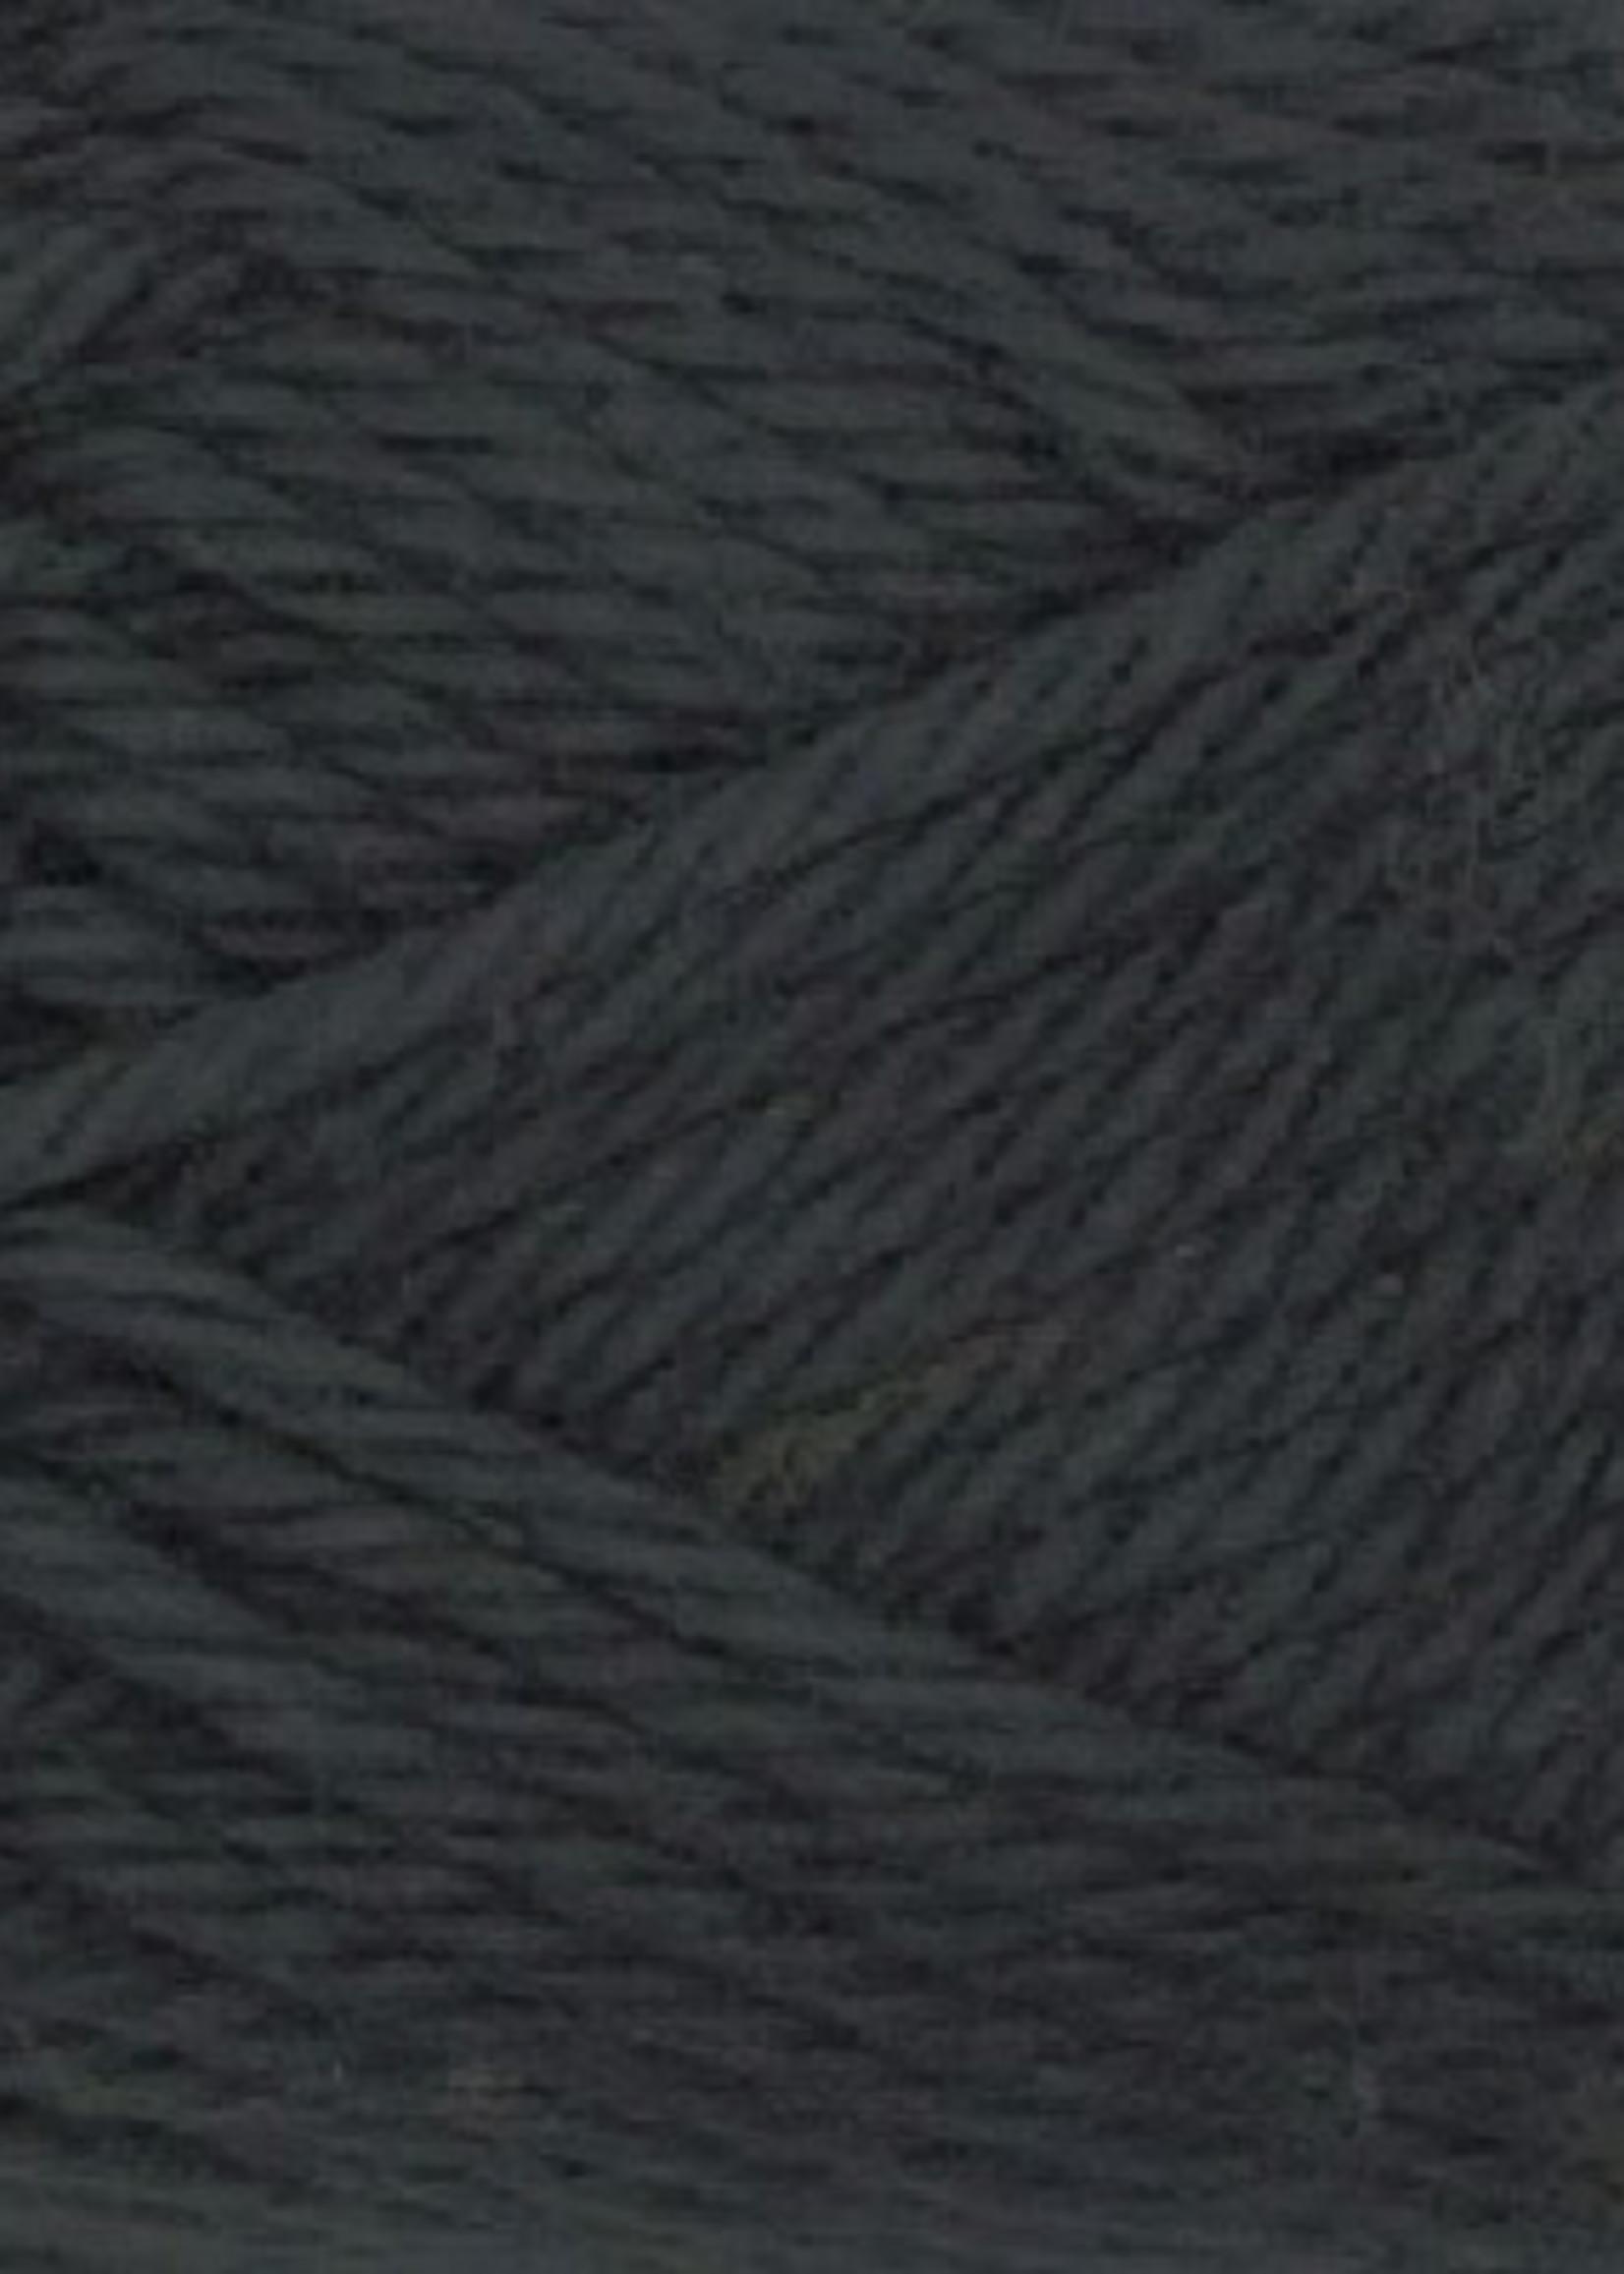 Estelle Yarns Sudz Cotton #53952 Black